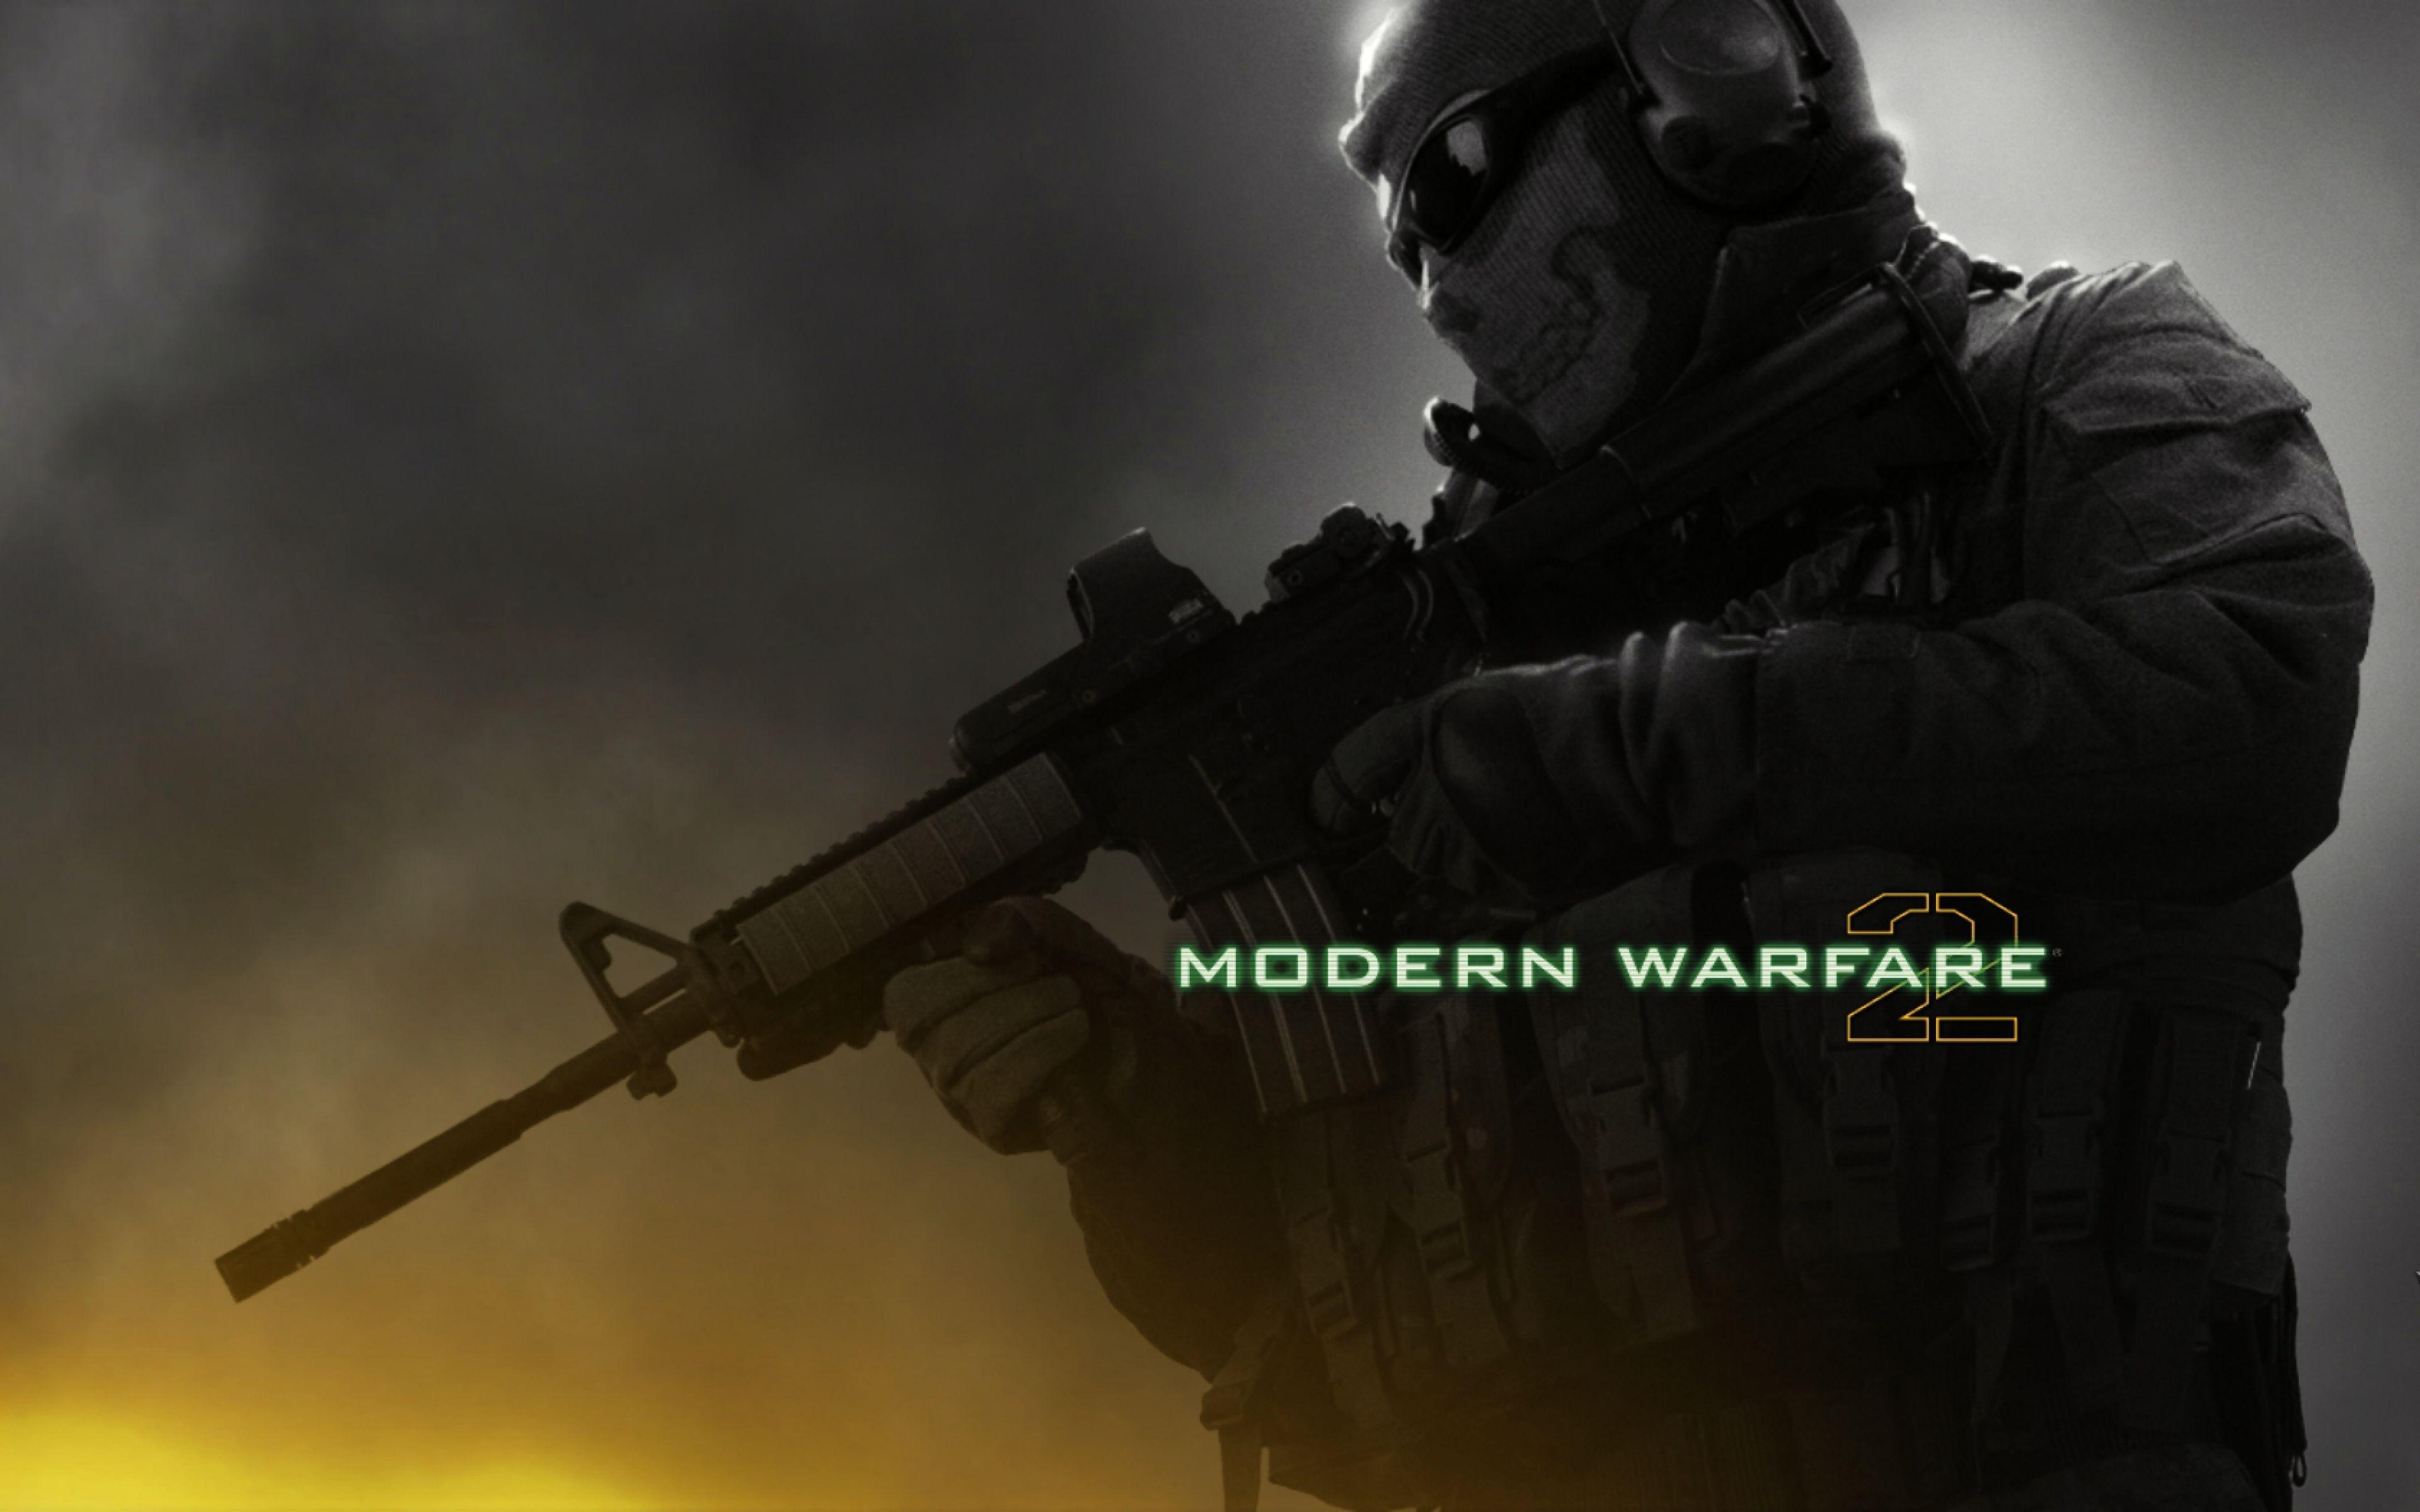 Call Of Duty: Modern Warfare 2 HD Wallpapers - Wallpaper Cave